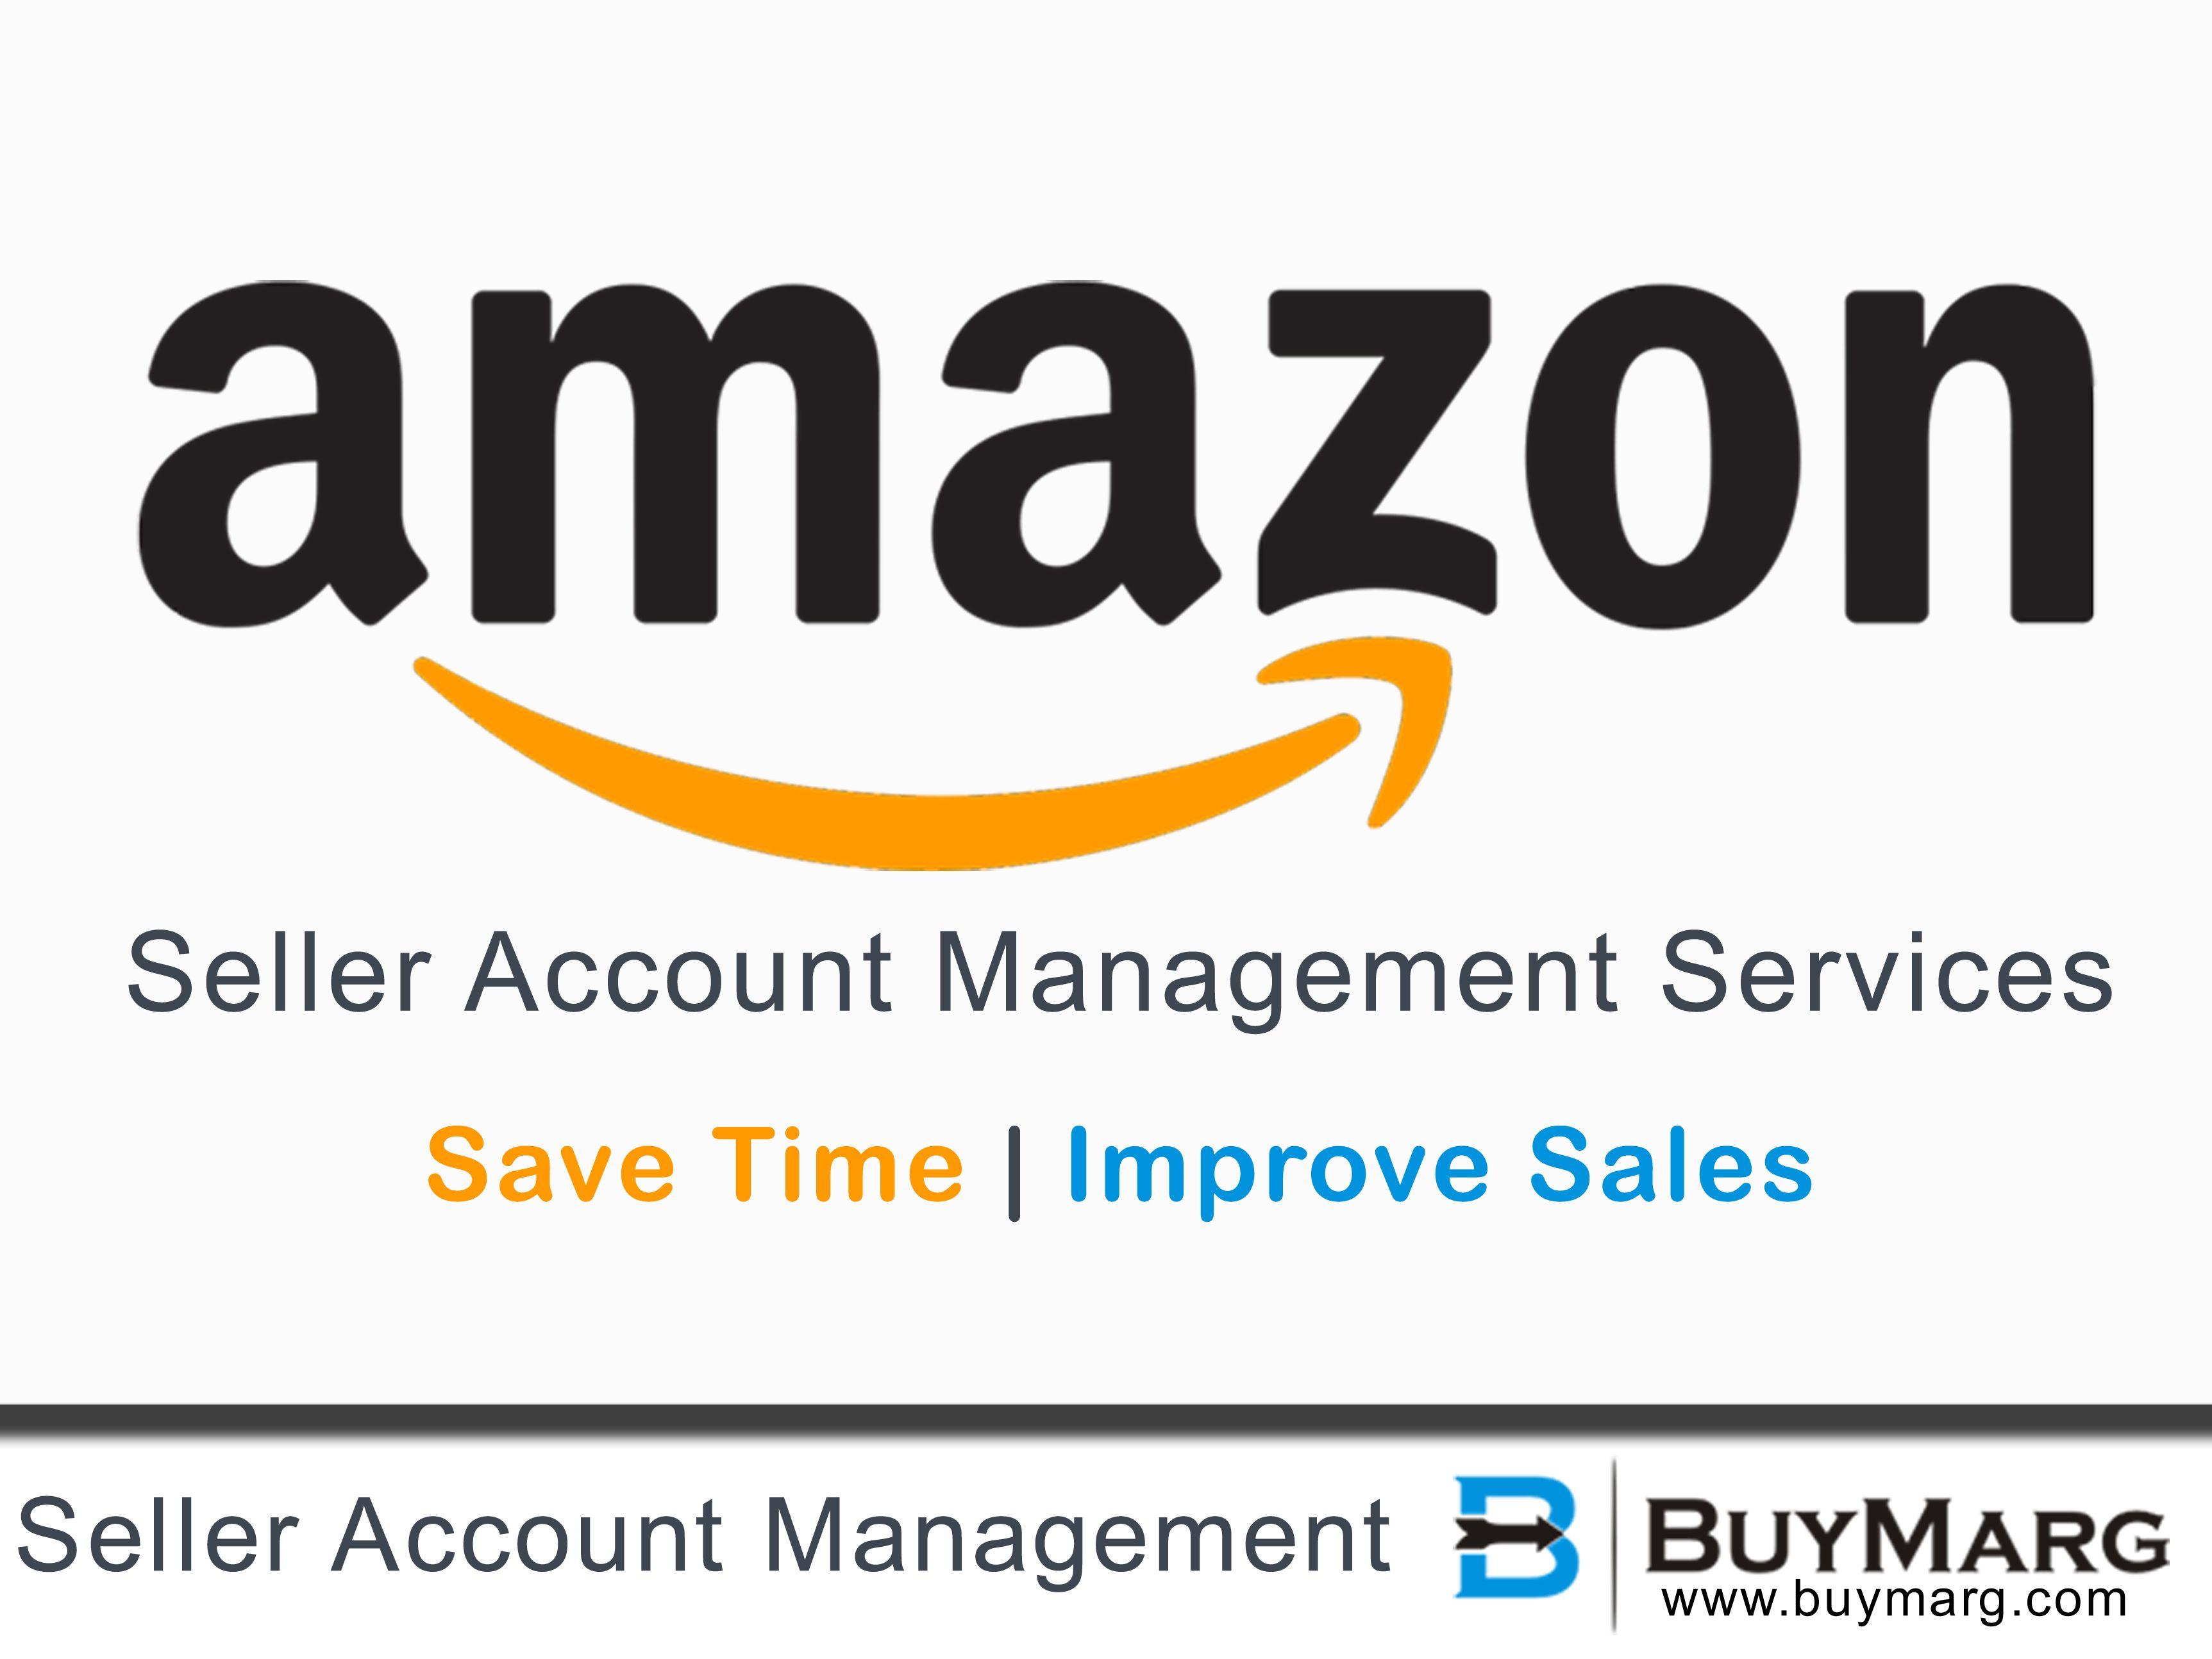 Amazon Seller Account Management Services Buymarg Buymarg